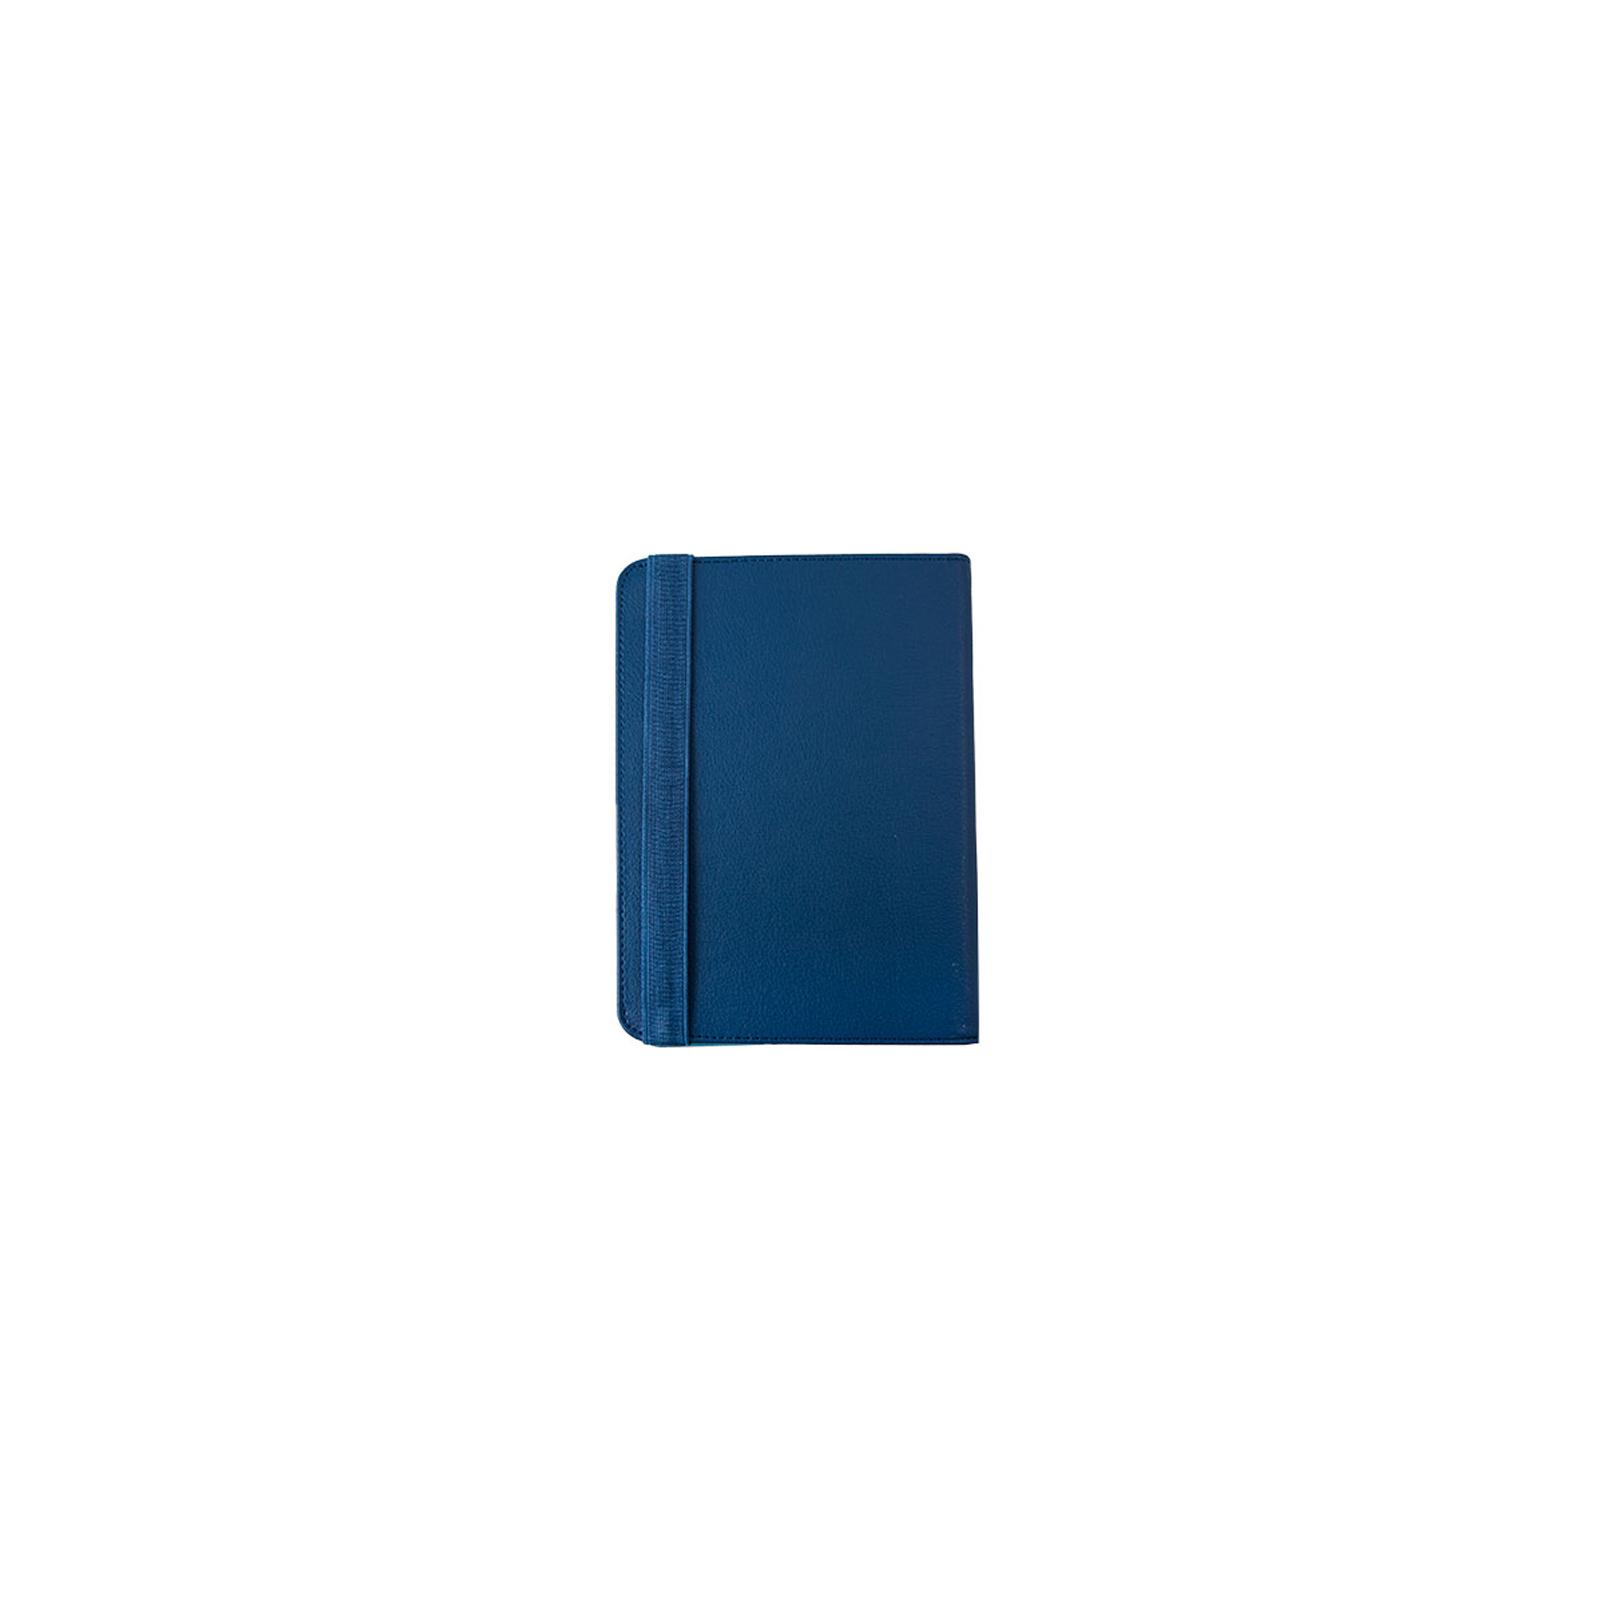 "Чехол для планшета Vellini 7"" Universal stand Dark Blue (216877) изображение 5"